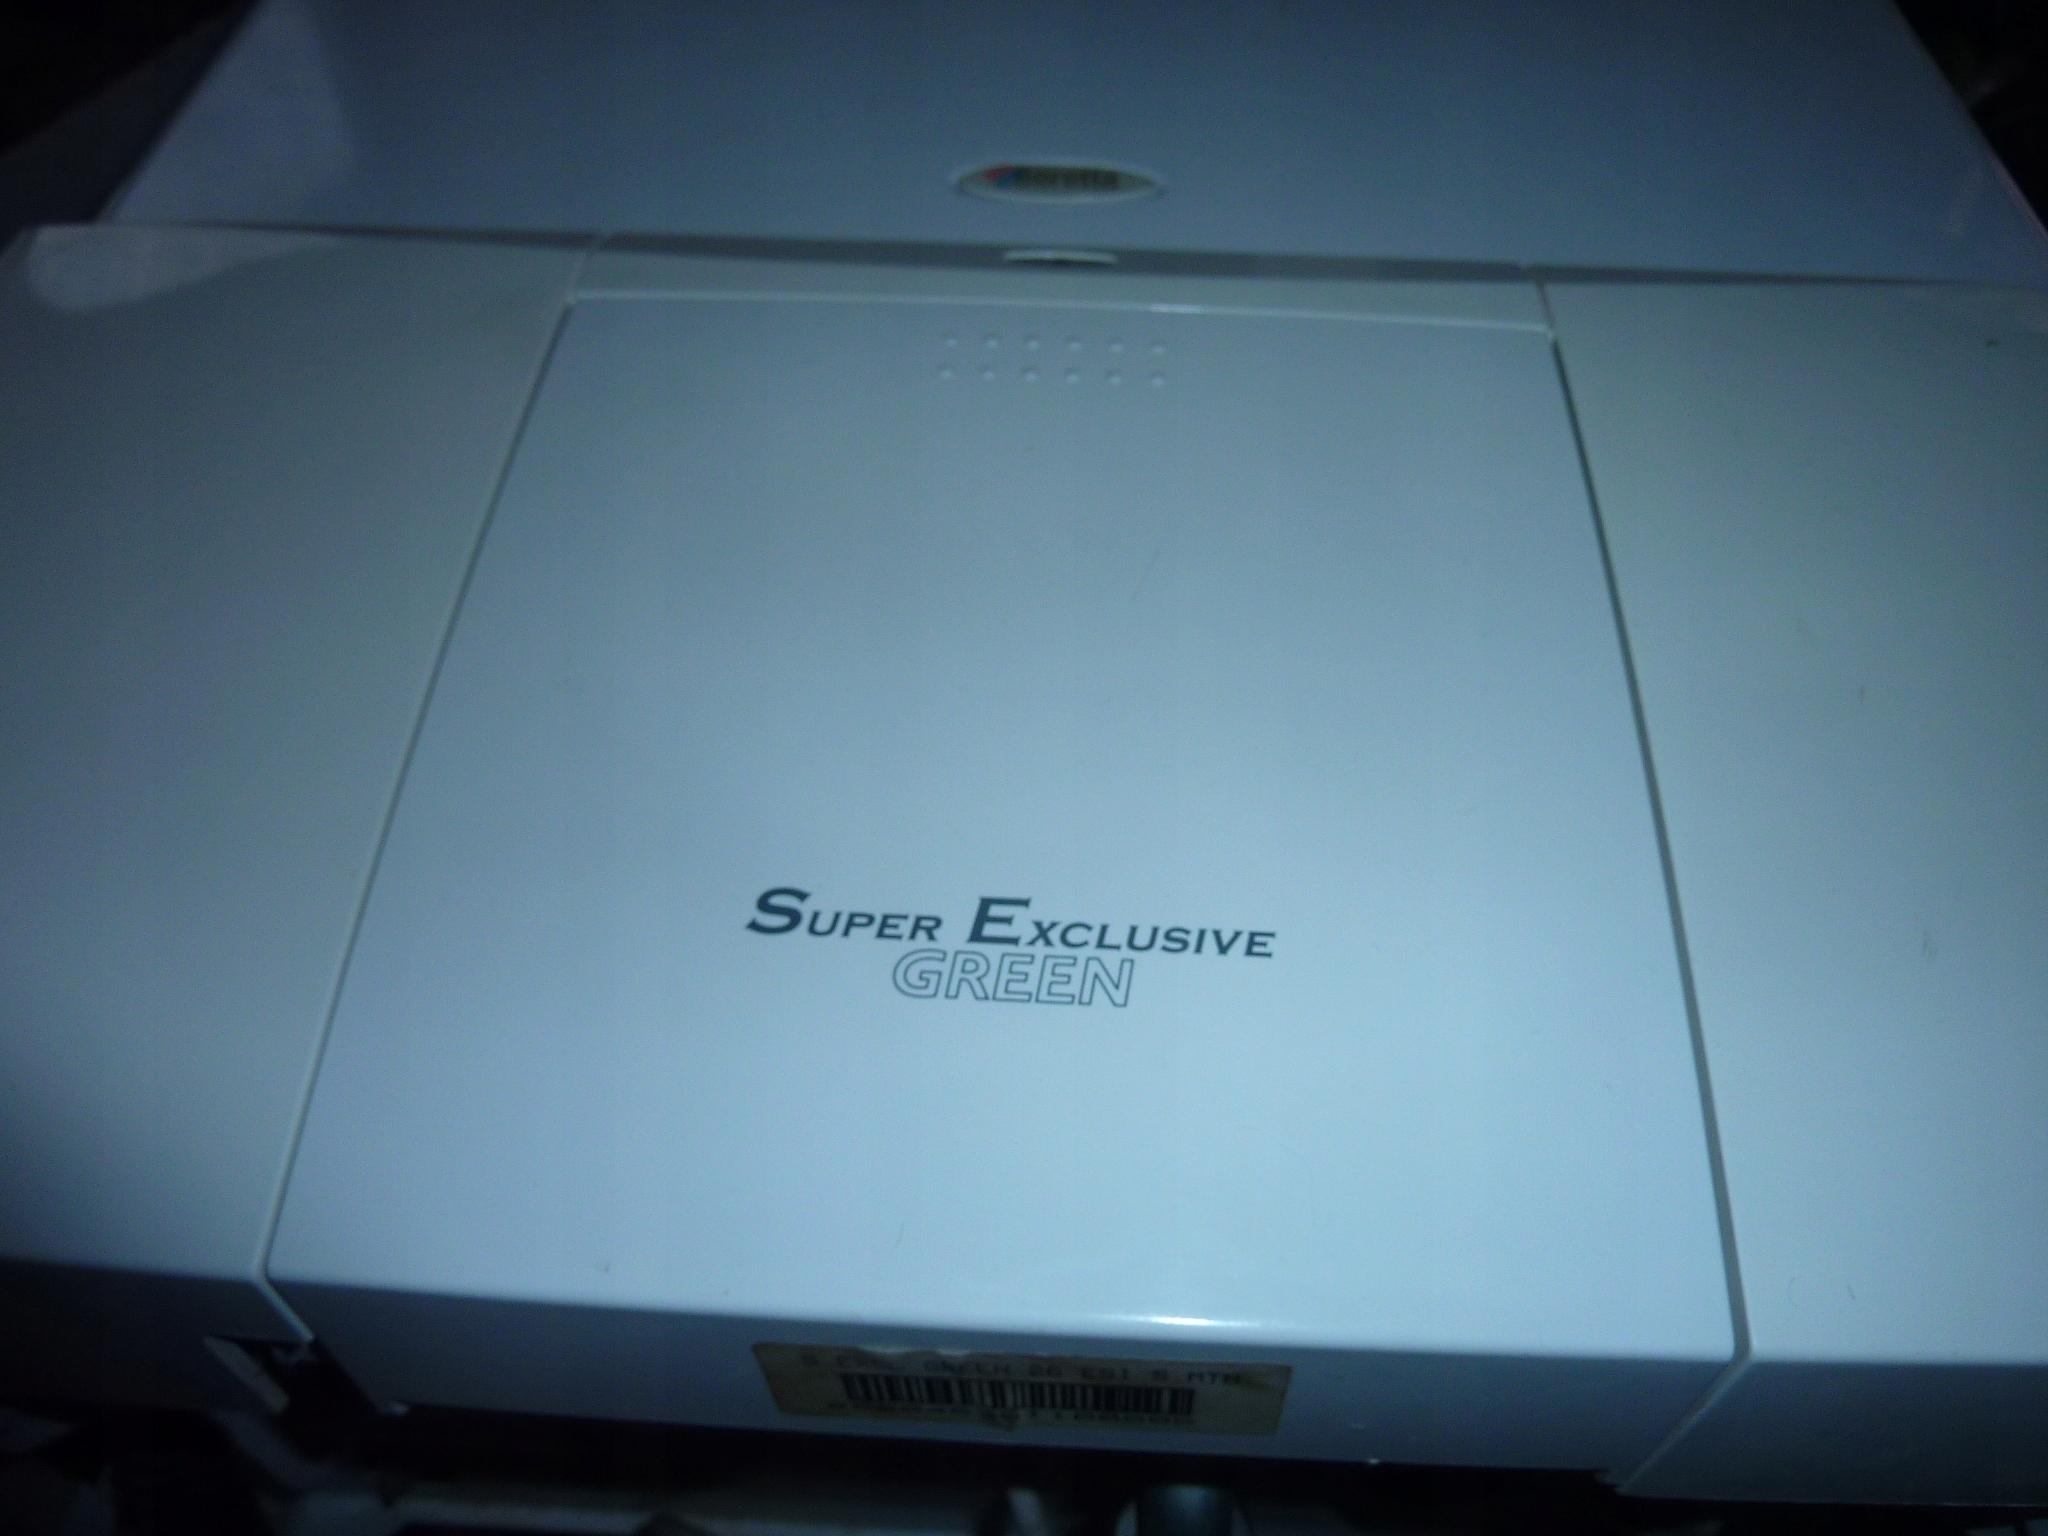 Beretta Super Exclusive Green 26 Esi S Kondensat